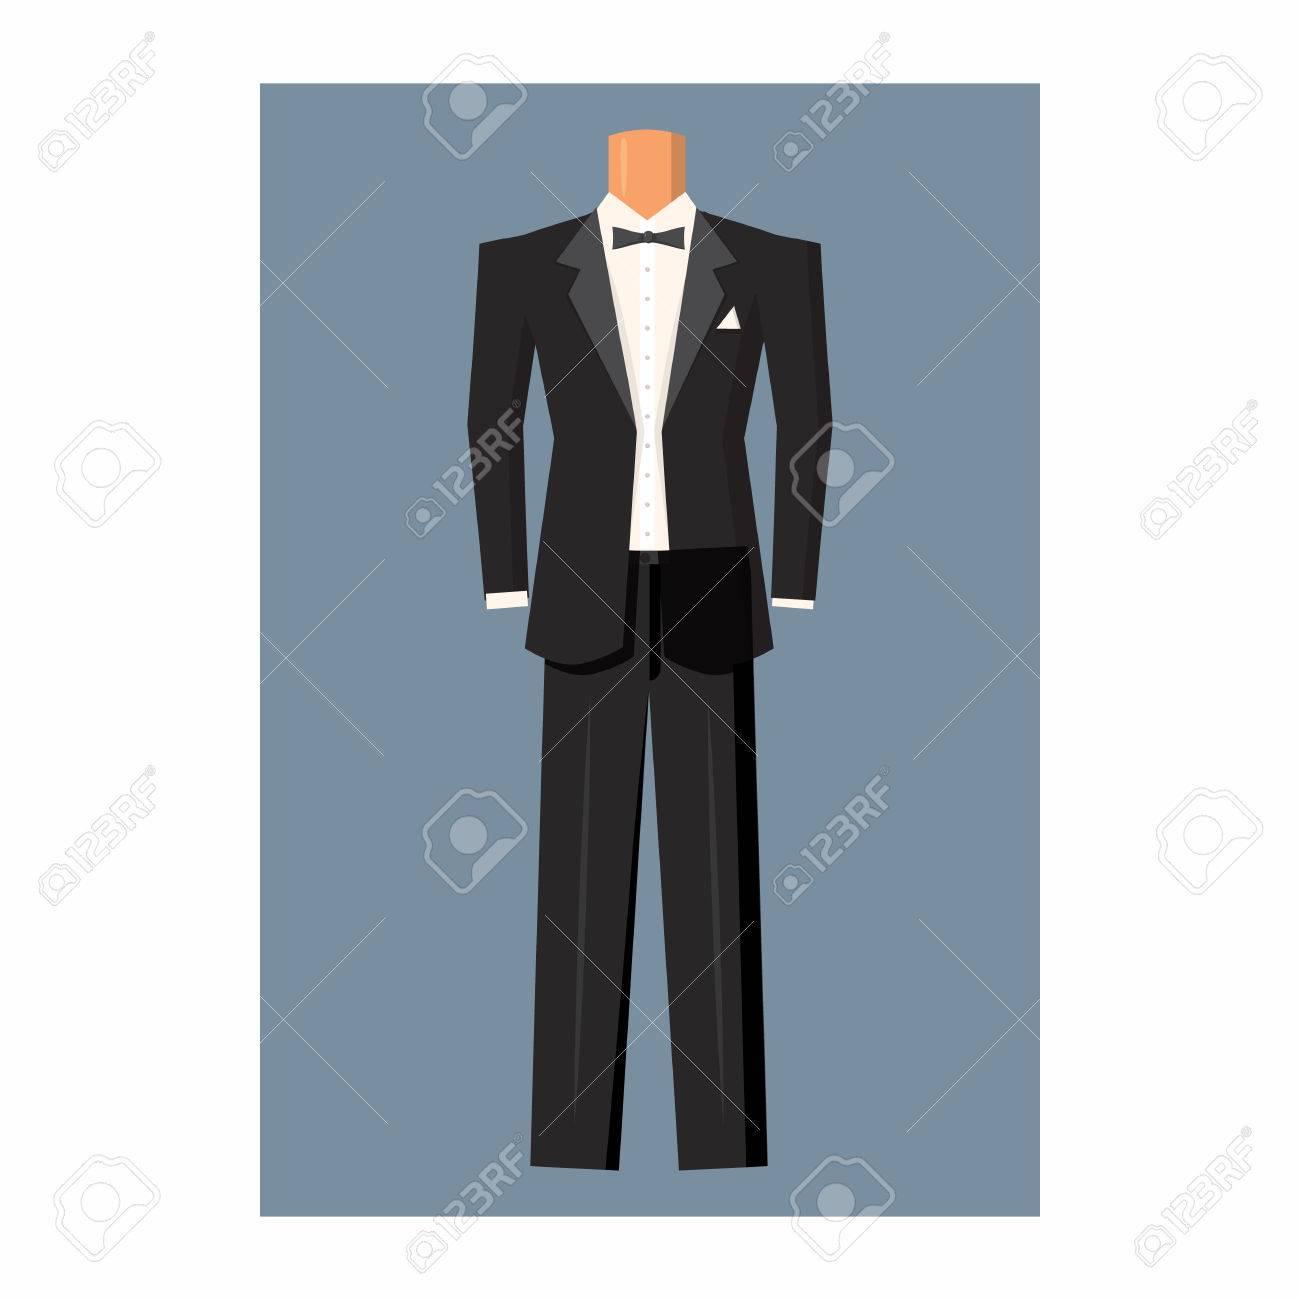 wedding tuxedo icon in cartoon style on a white background royalty